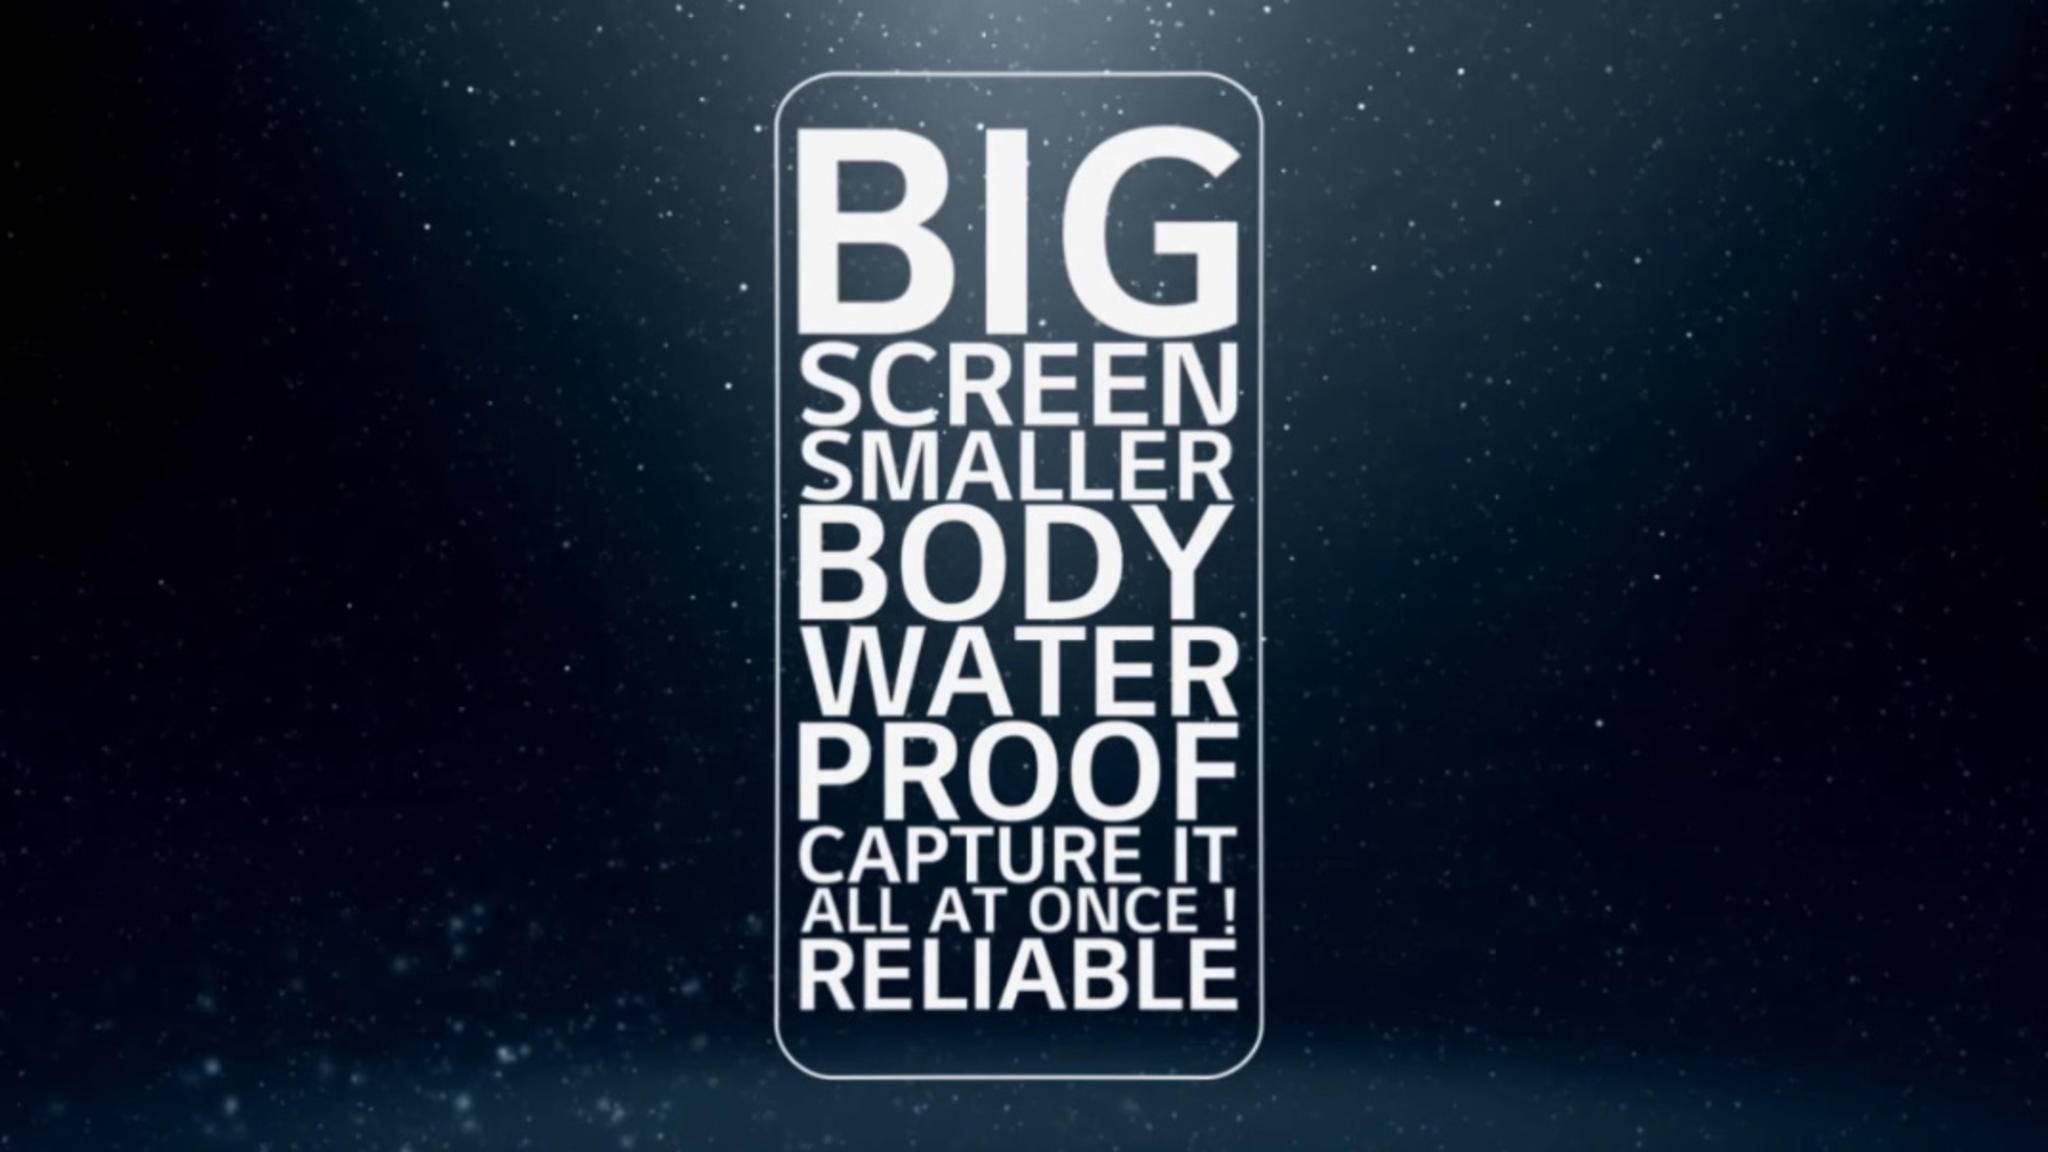 Das LG G6: Randloses Display, aber kein High-End-Chip?